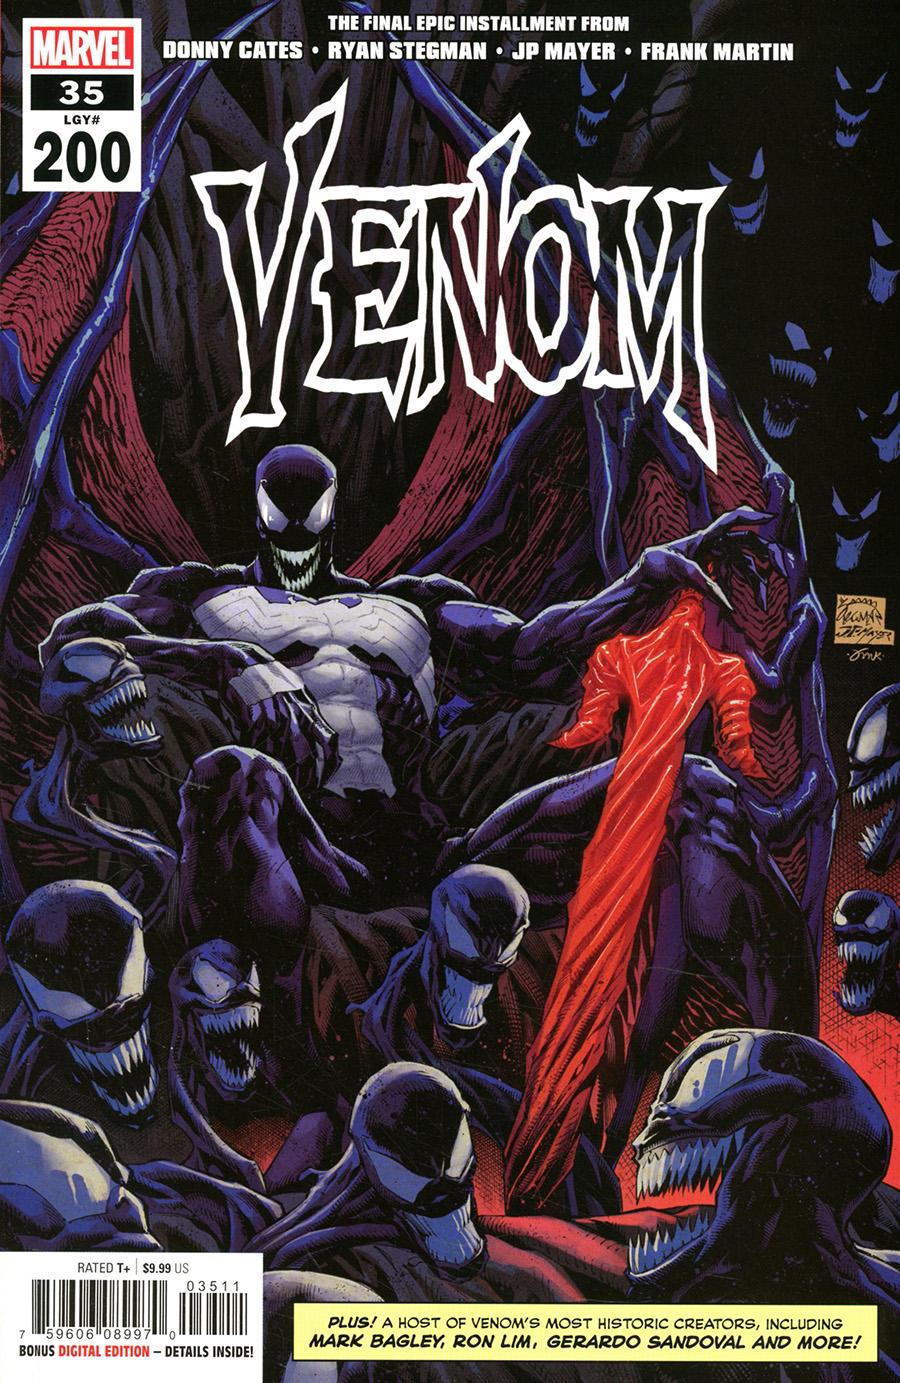 Venom Vol 4 #35 Cover A Regular Ryan Stegman Cover (#200)